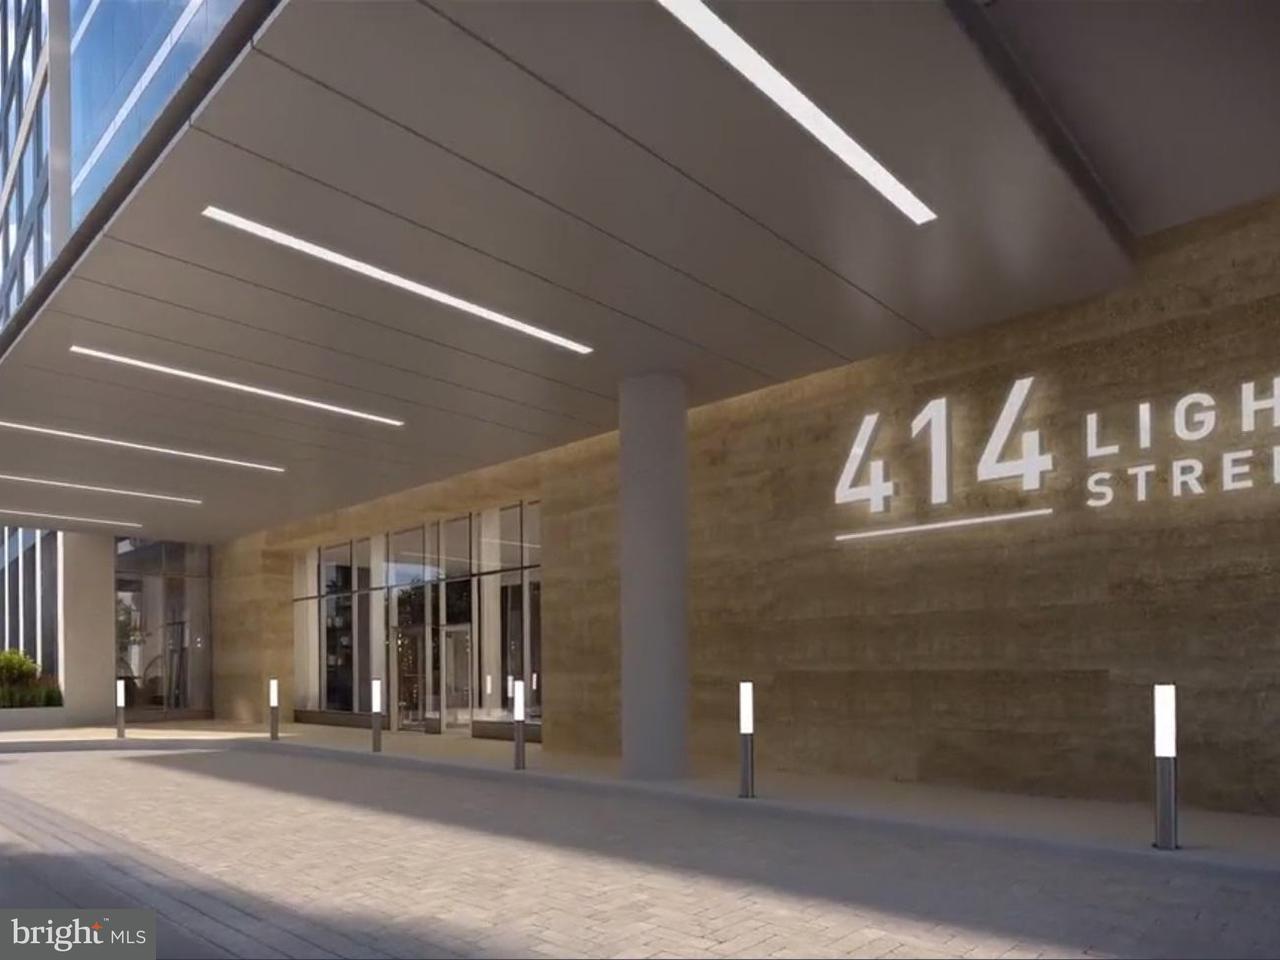 Condominium for Rent at 414 Light St #609 Baltimore, Maryland 21202 United States